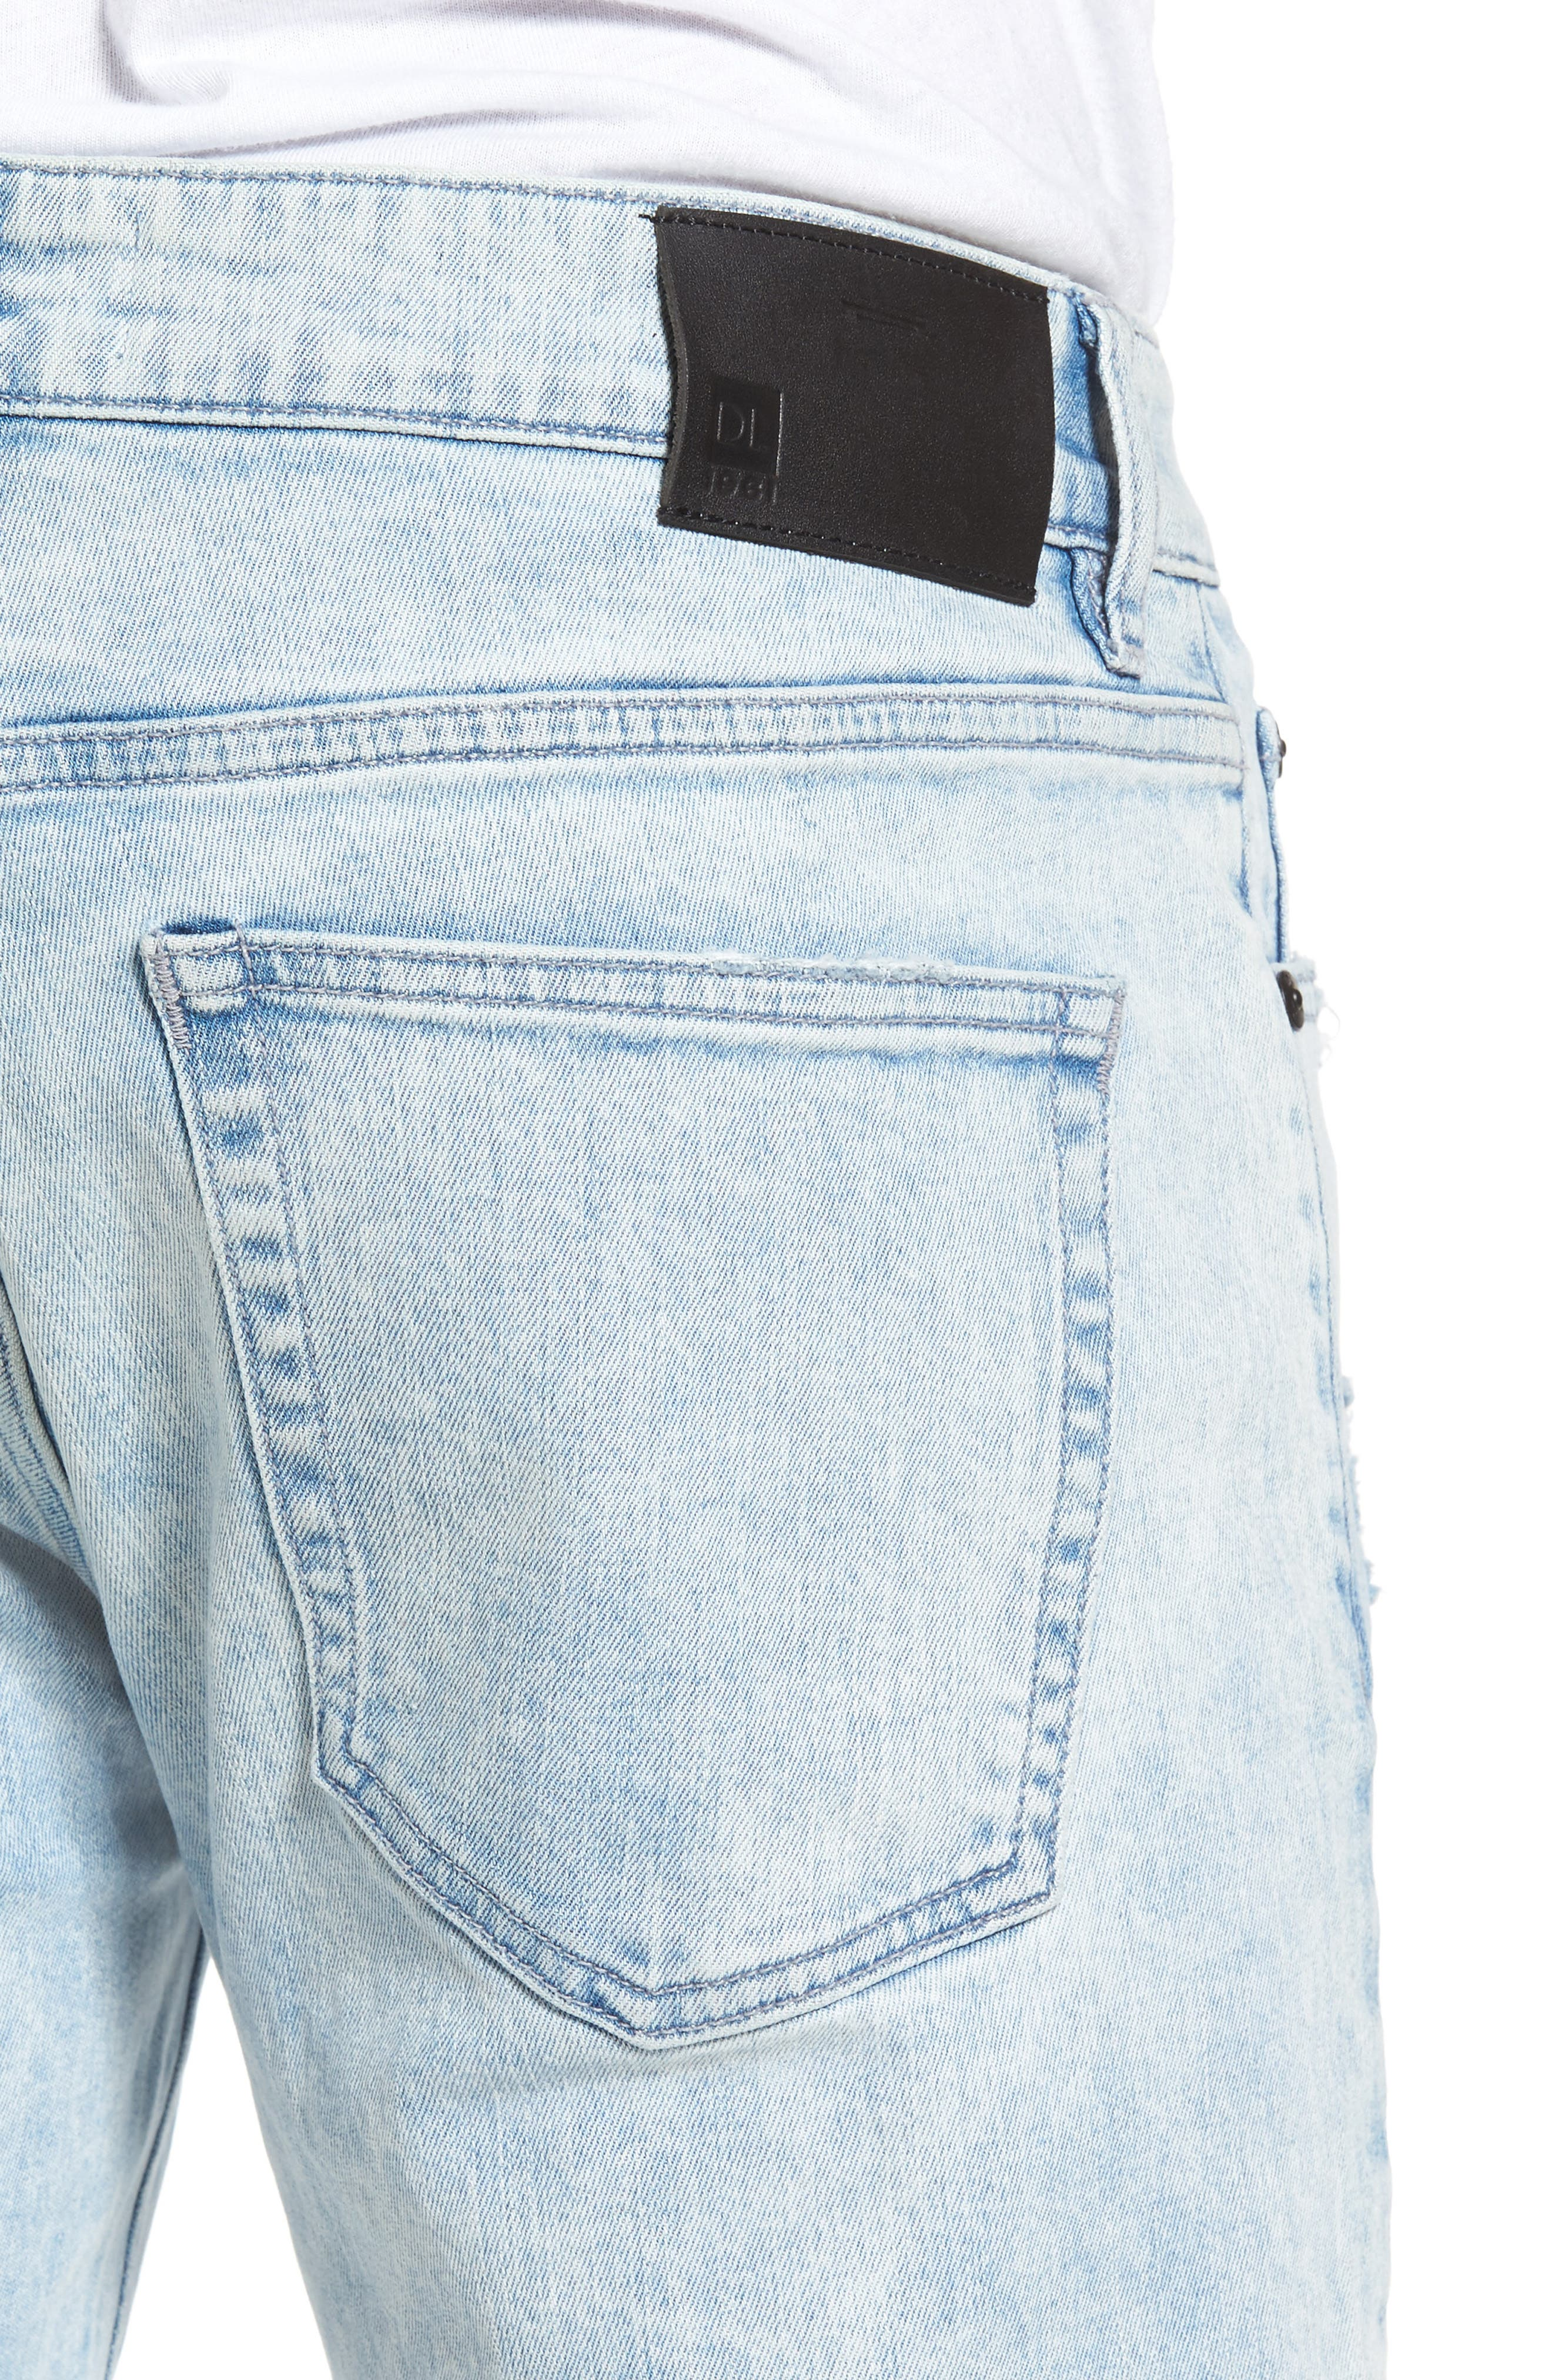 Nick Slim Fit Jeans,                             Alternate thumbnail 4, color,                             TORRENT